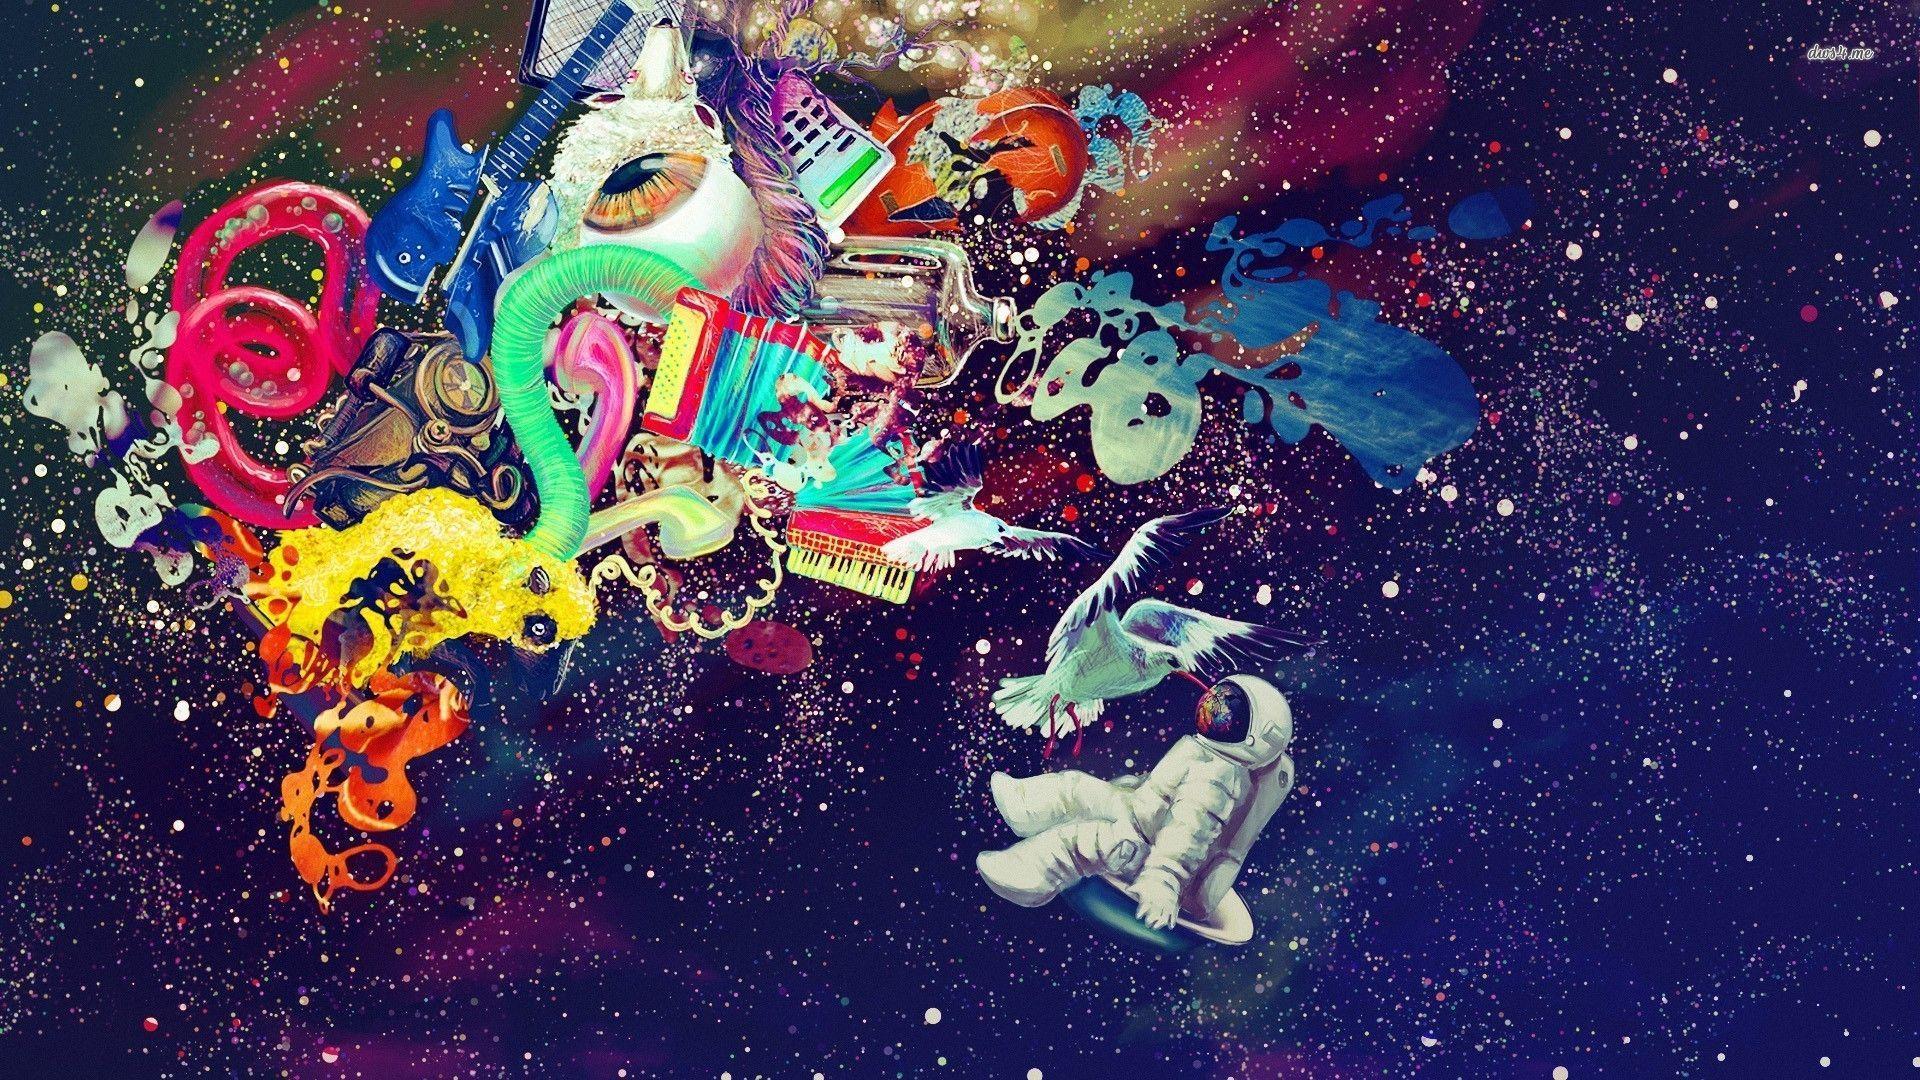 Astronaut Galaxy Wallpapers